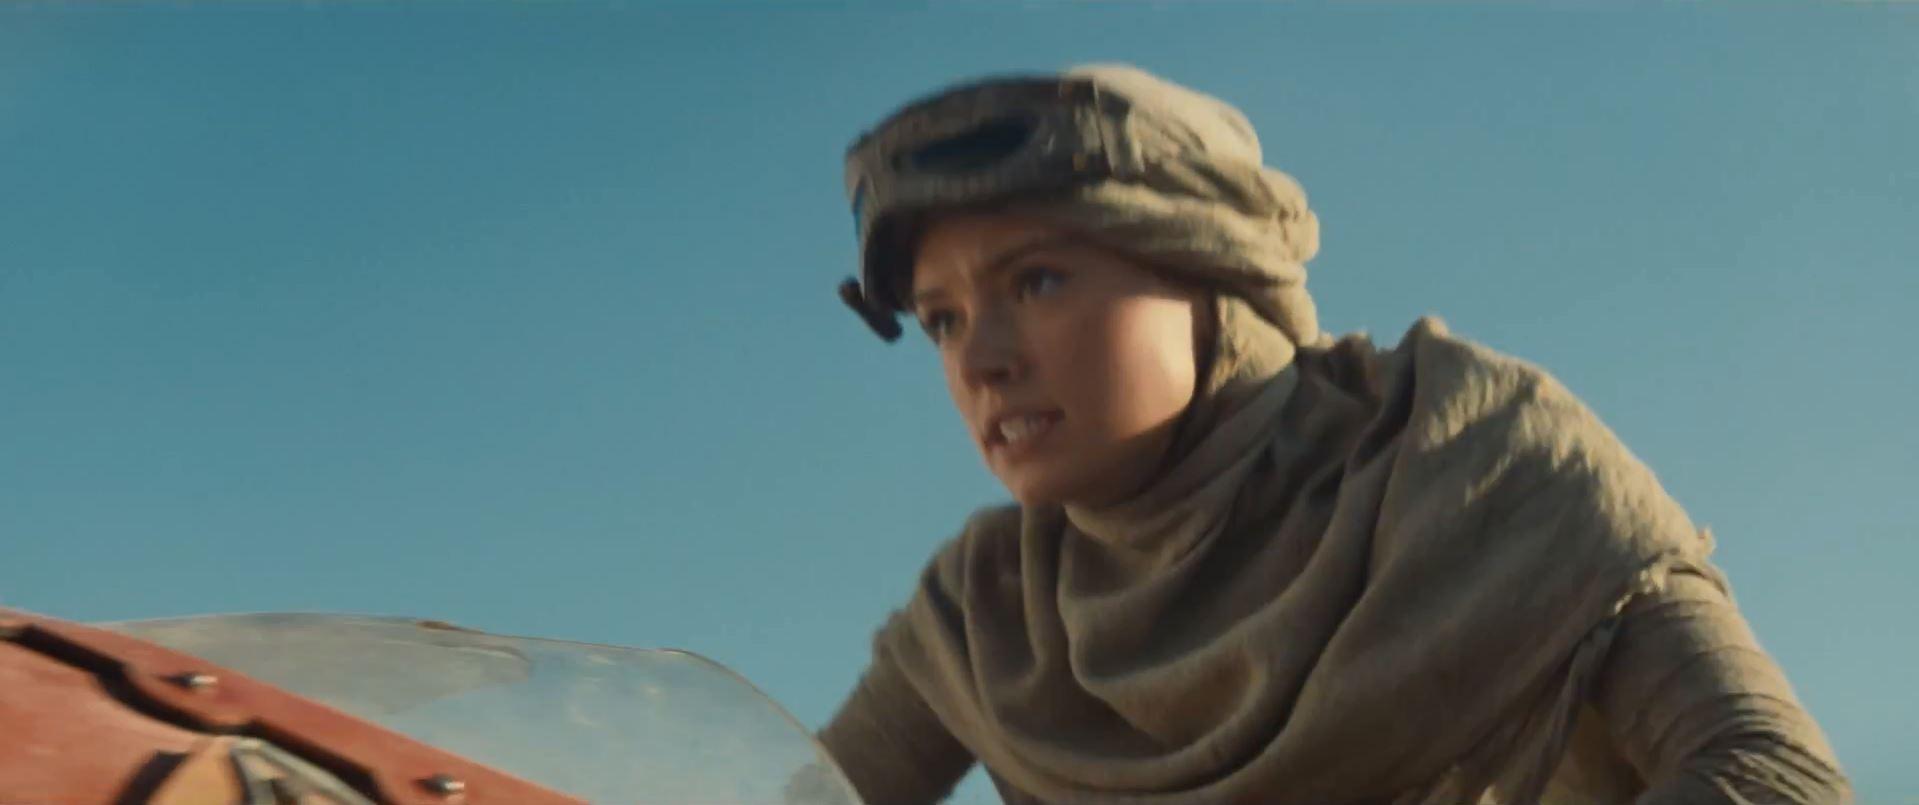 Daisy Ridley in Star Wars Episode 7 trailer released